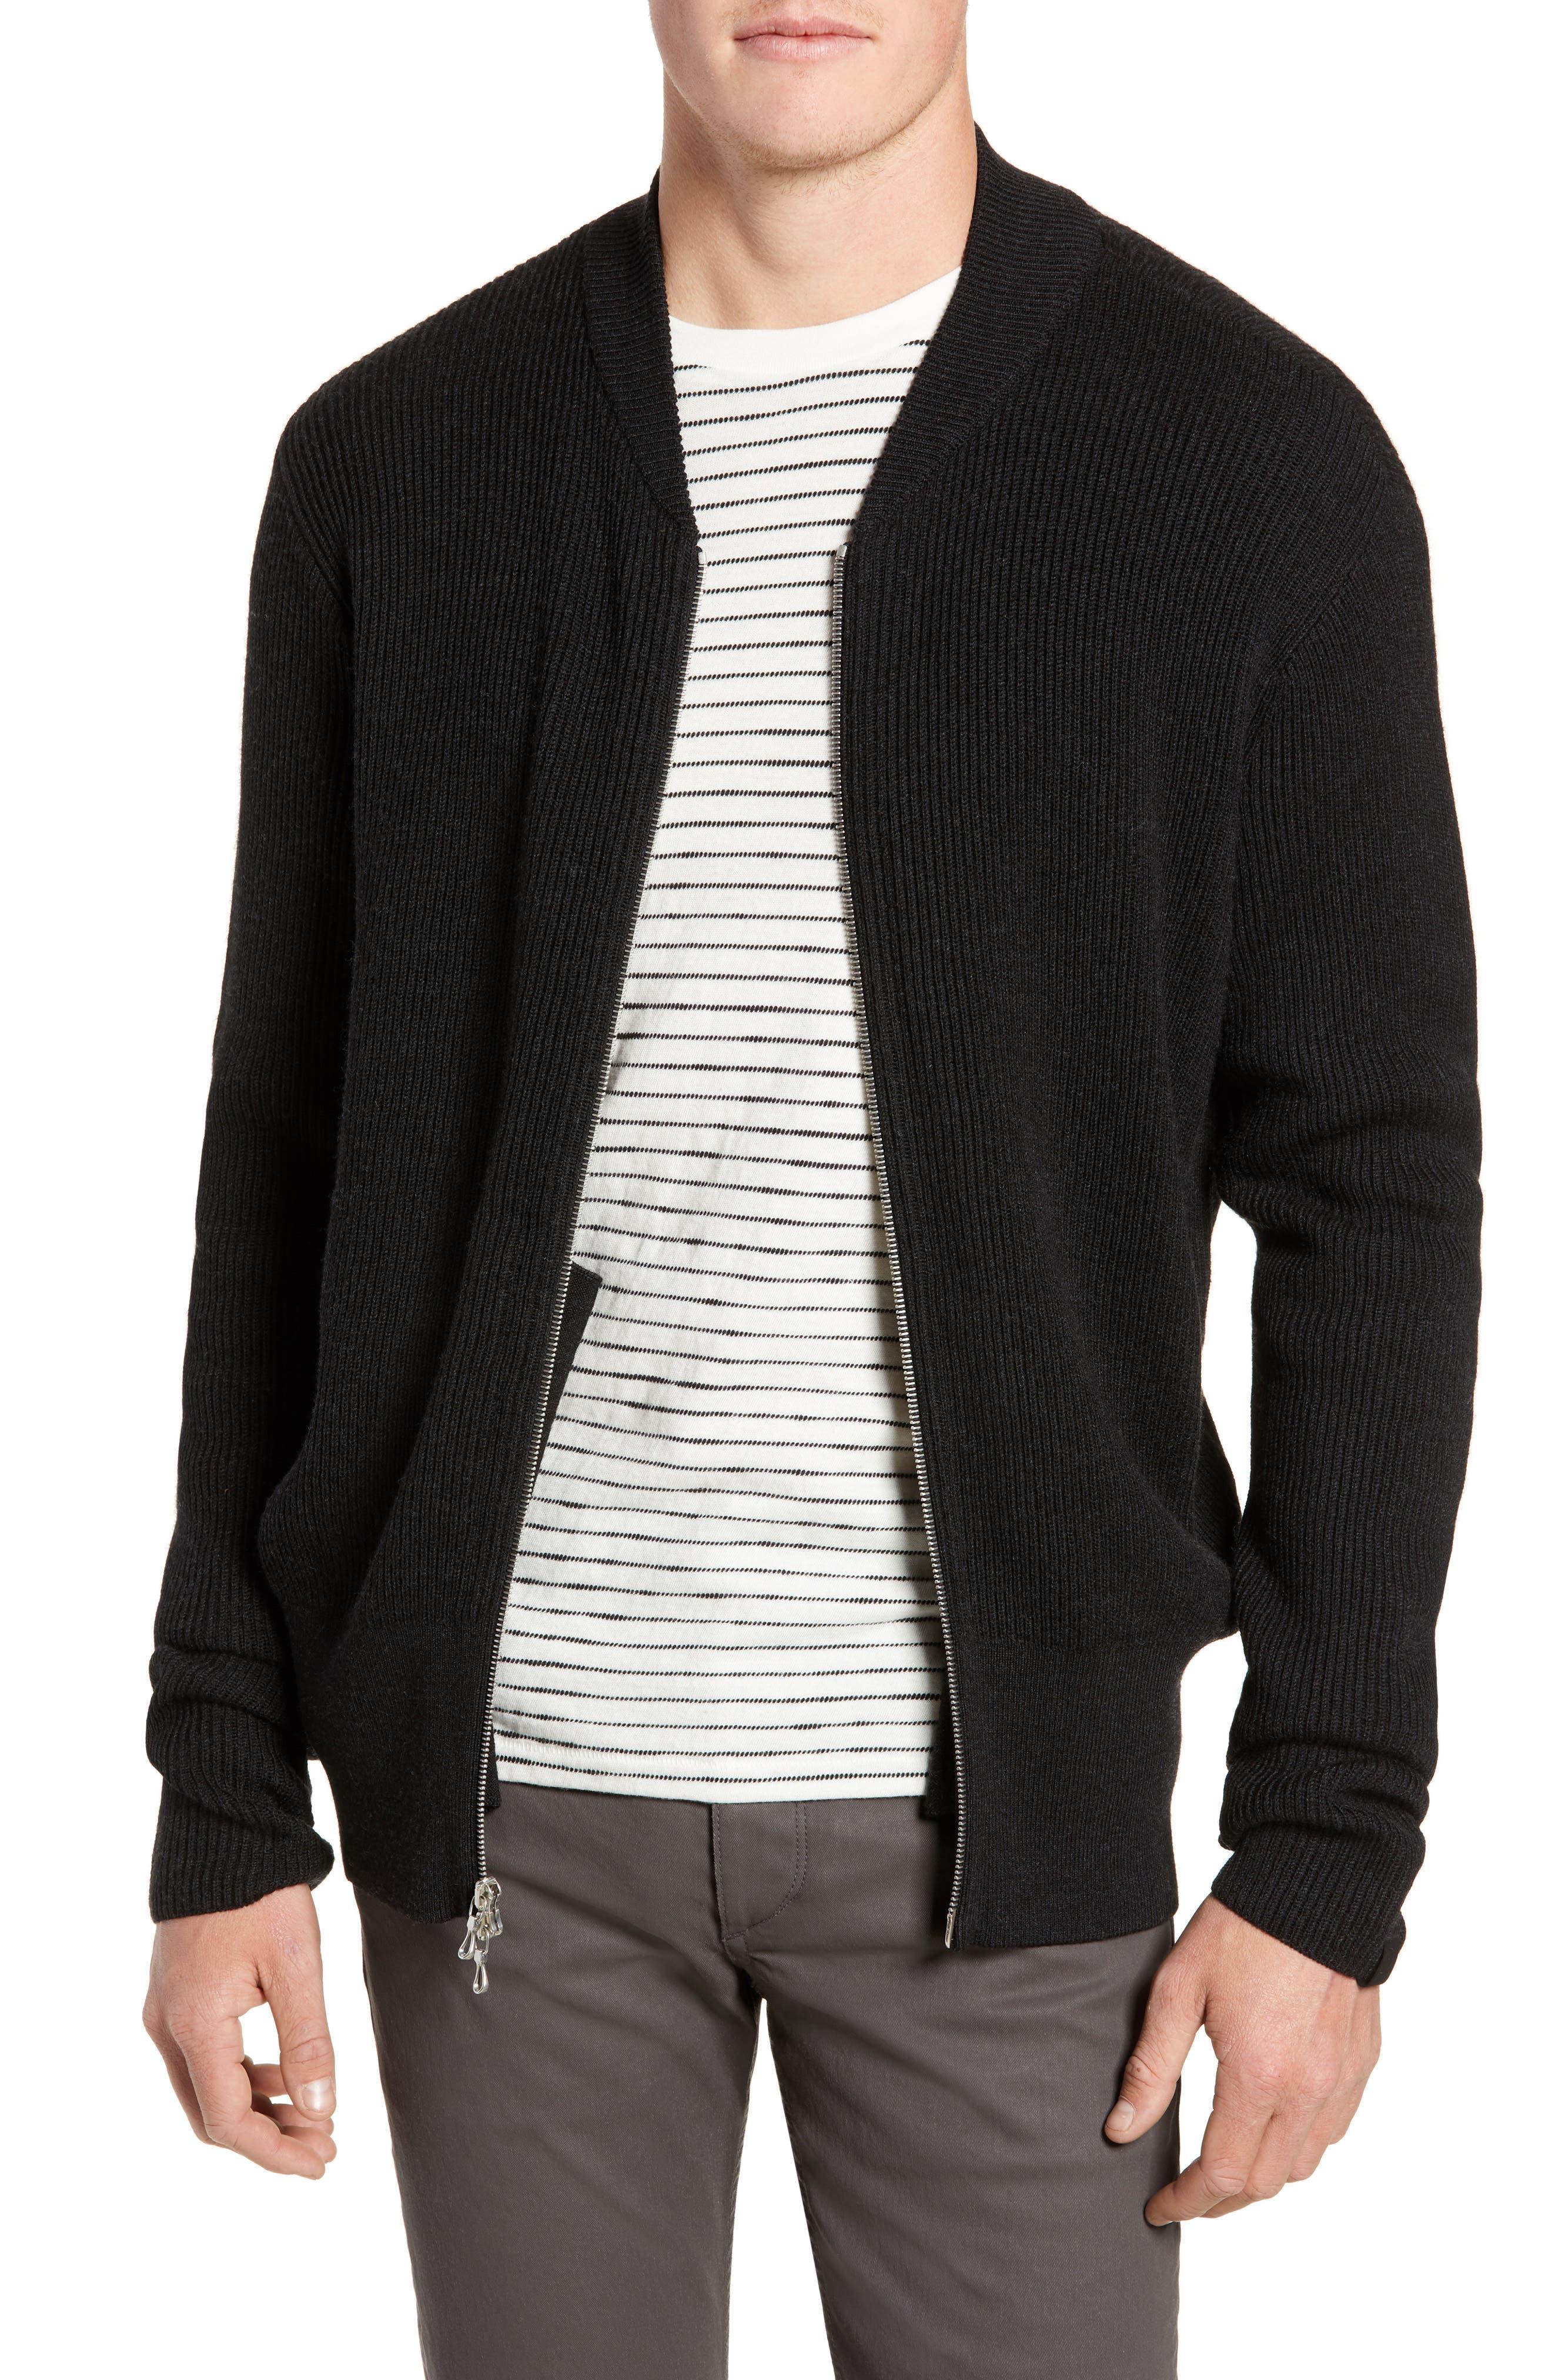 RAG & BONE, Andrew Zip Front Merino Wool Sweater, Main thumbnail 1, color, BLACK HEATHER